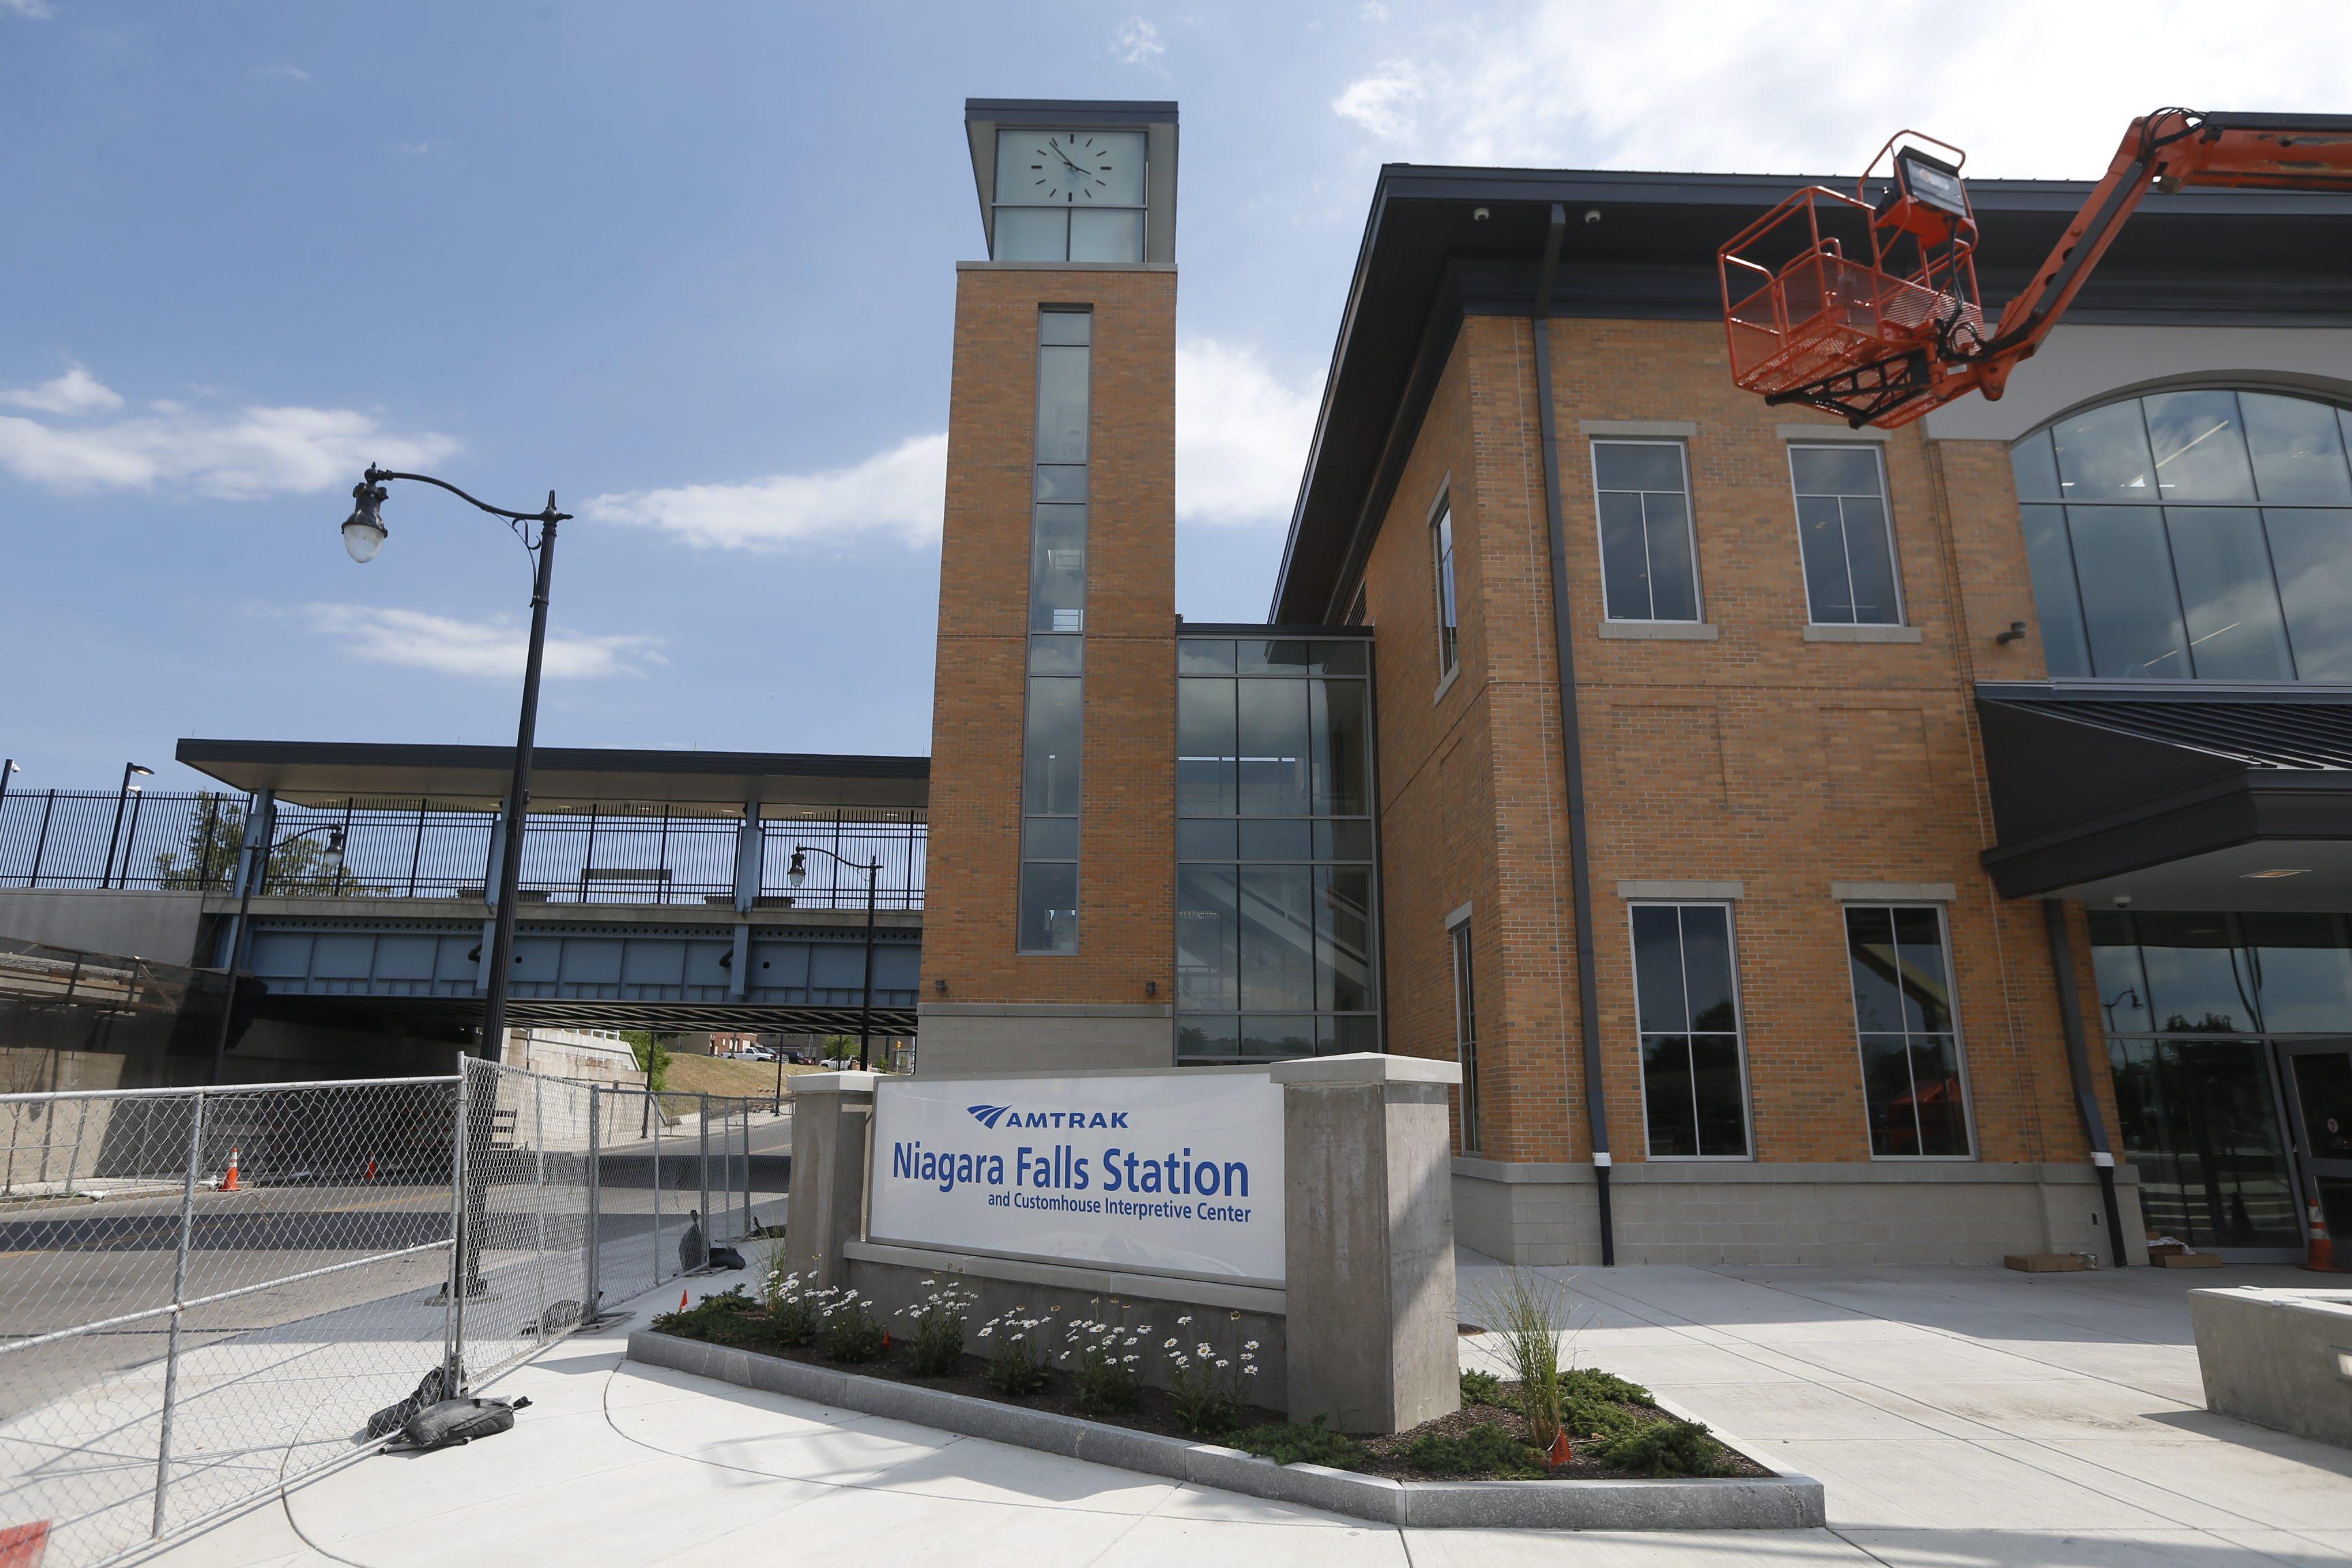 The new $43 million Amtrak station in Niagara Falls. (Robert Kirkham/Buffalo News file photo)